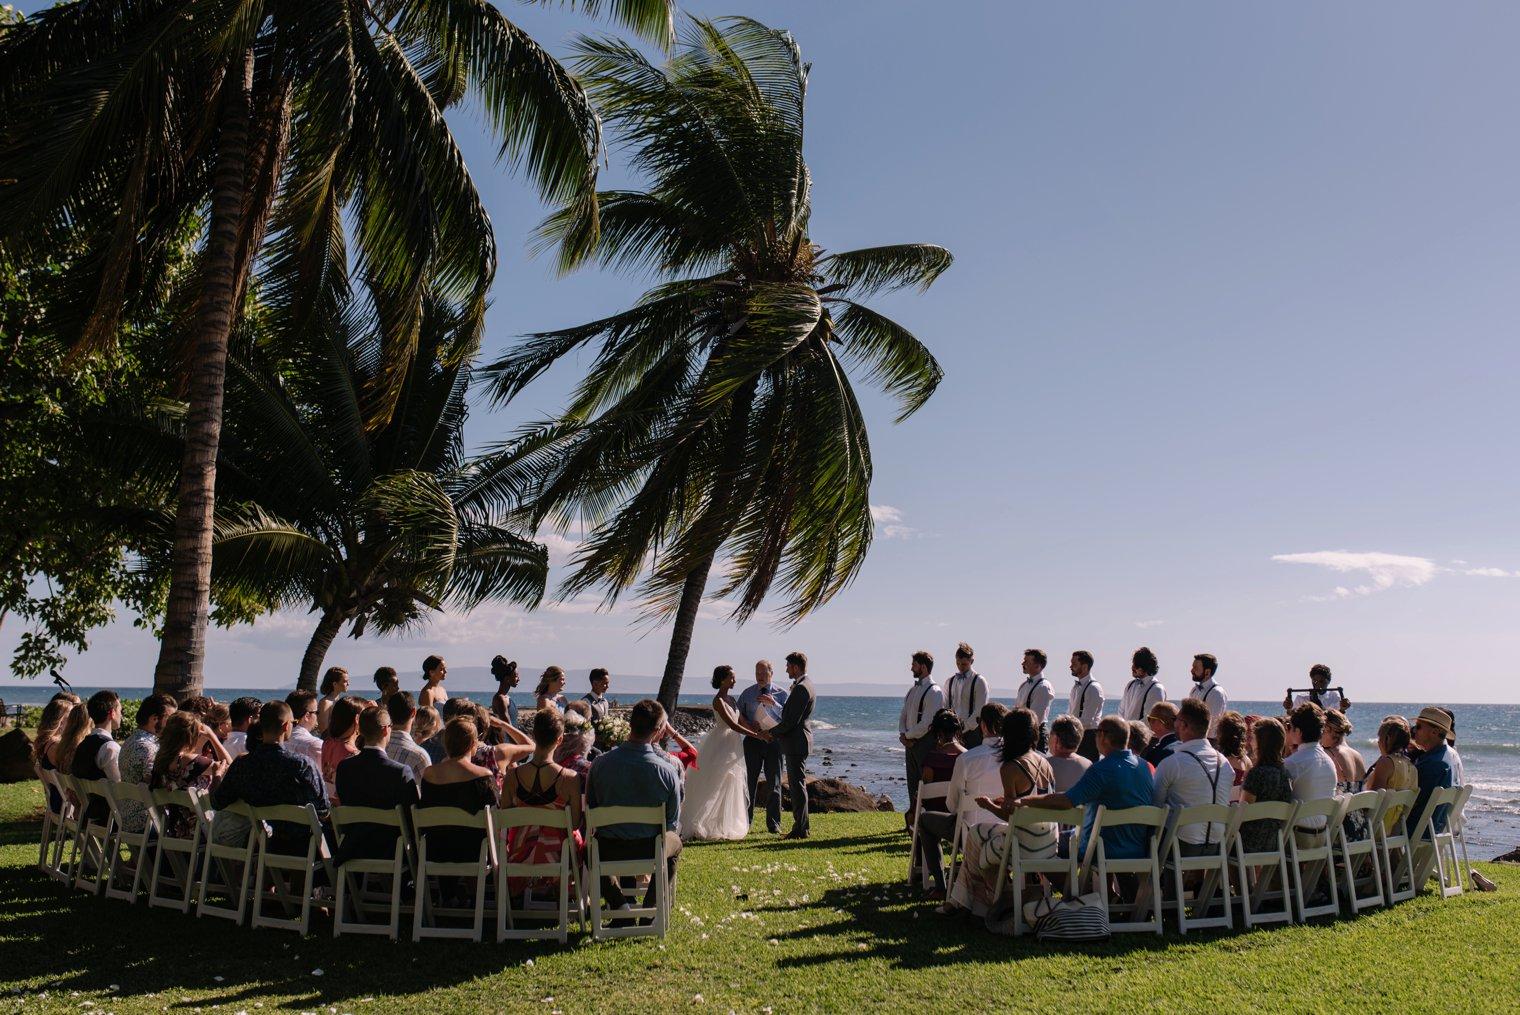 destination wedding ceremony at olowalu plantation house on maui